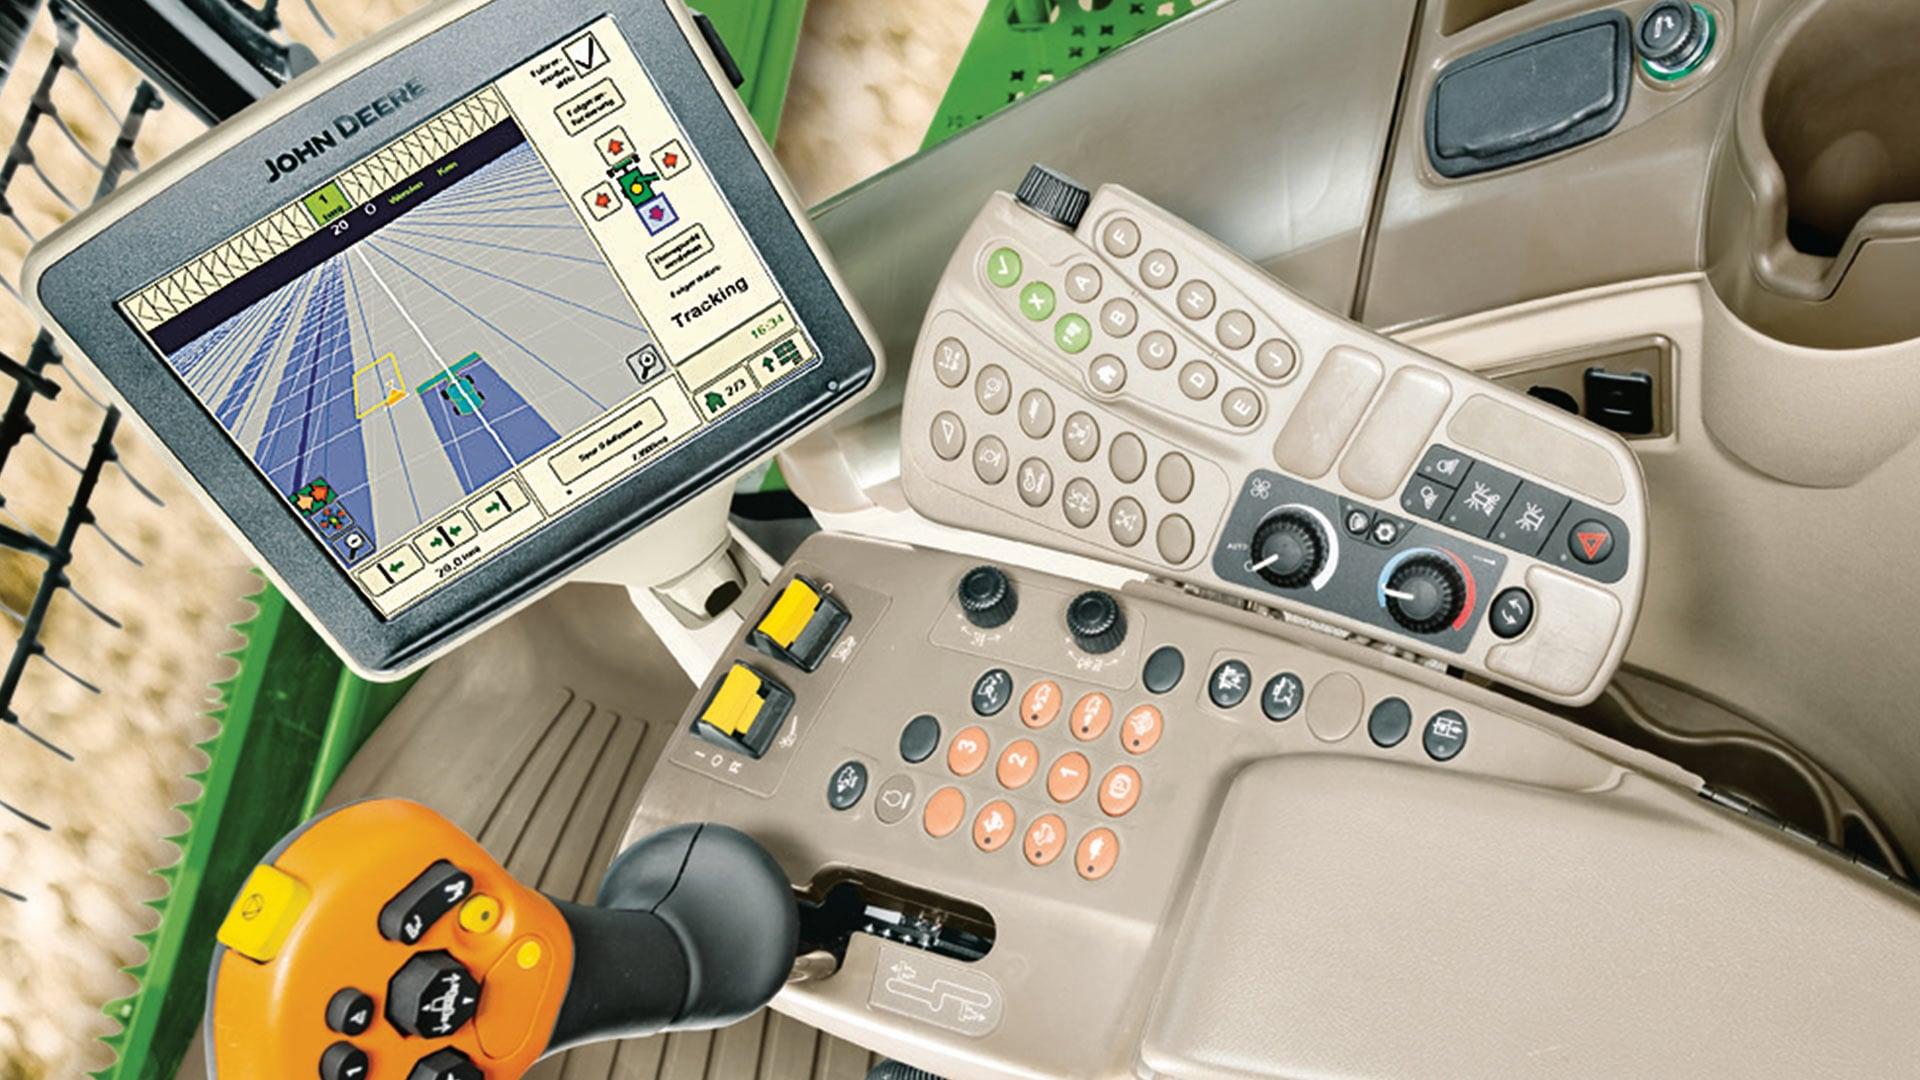 technology-r2b004385-1920x1080